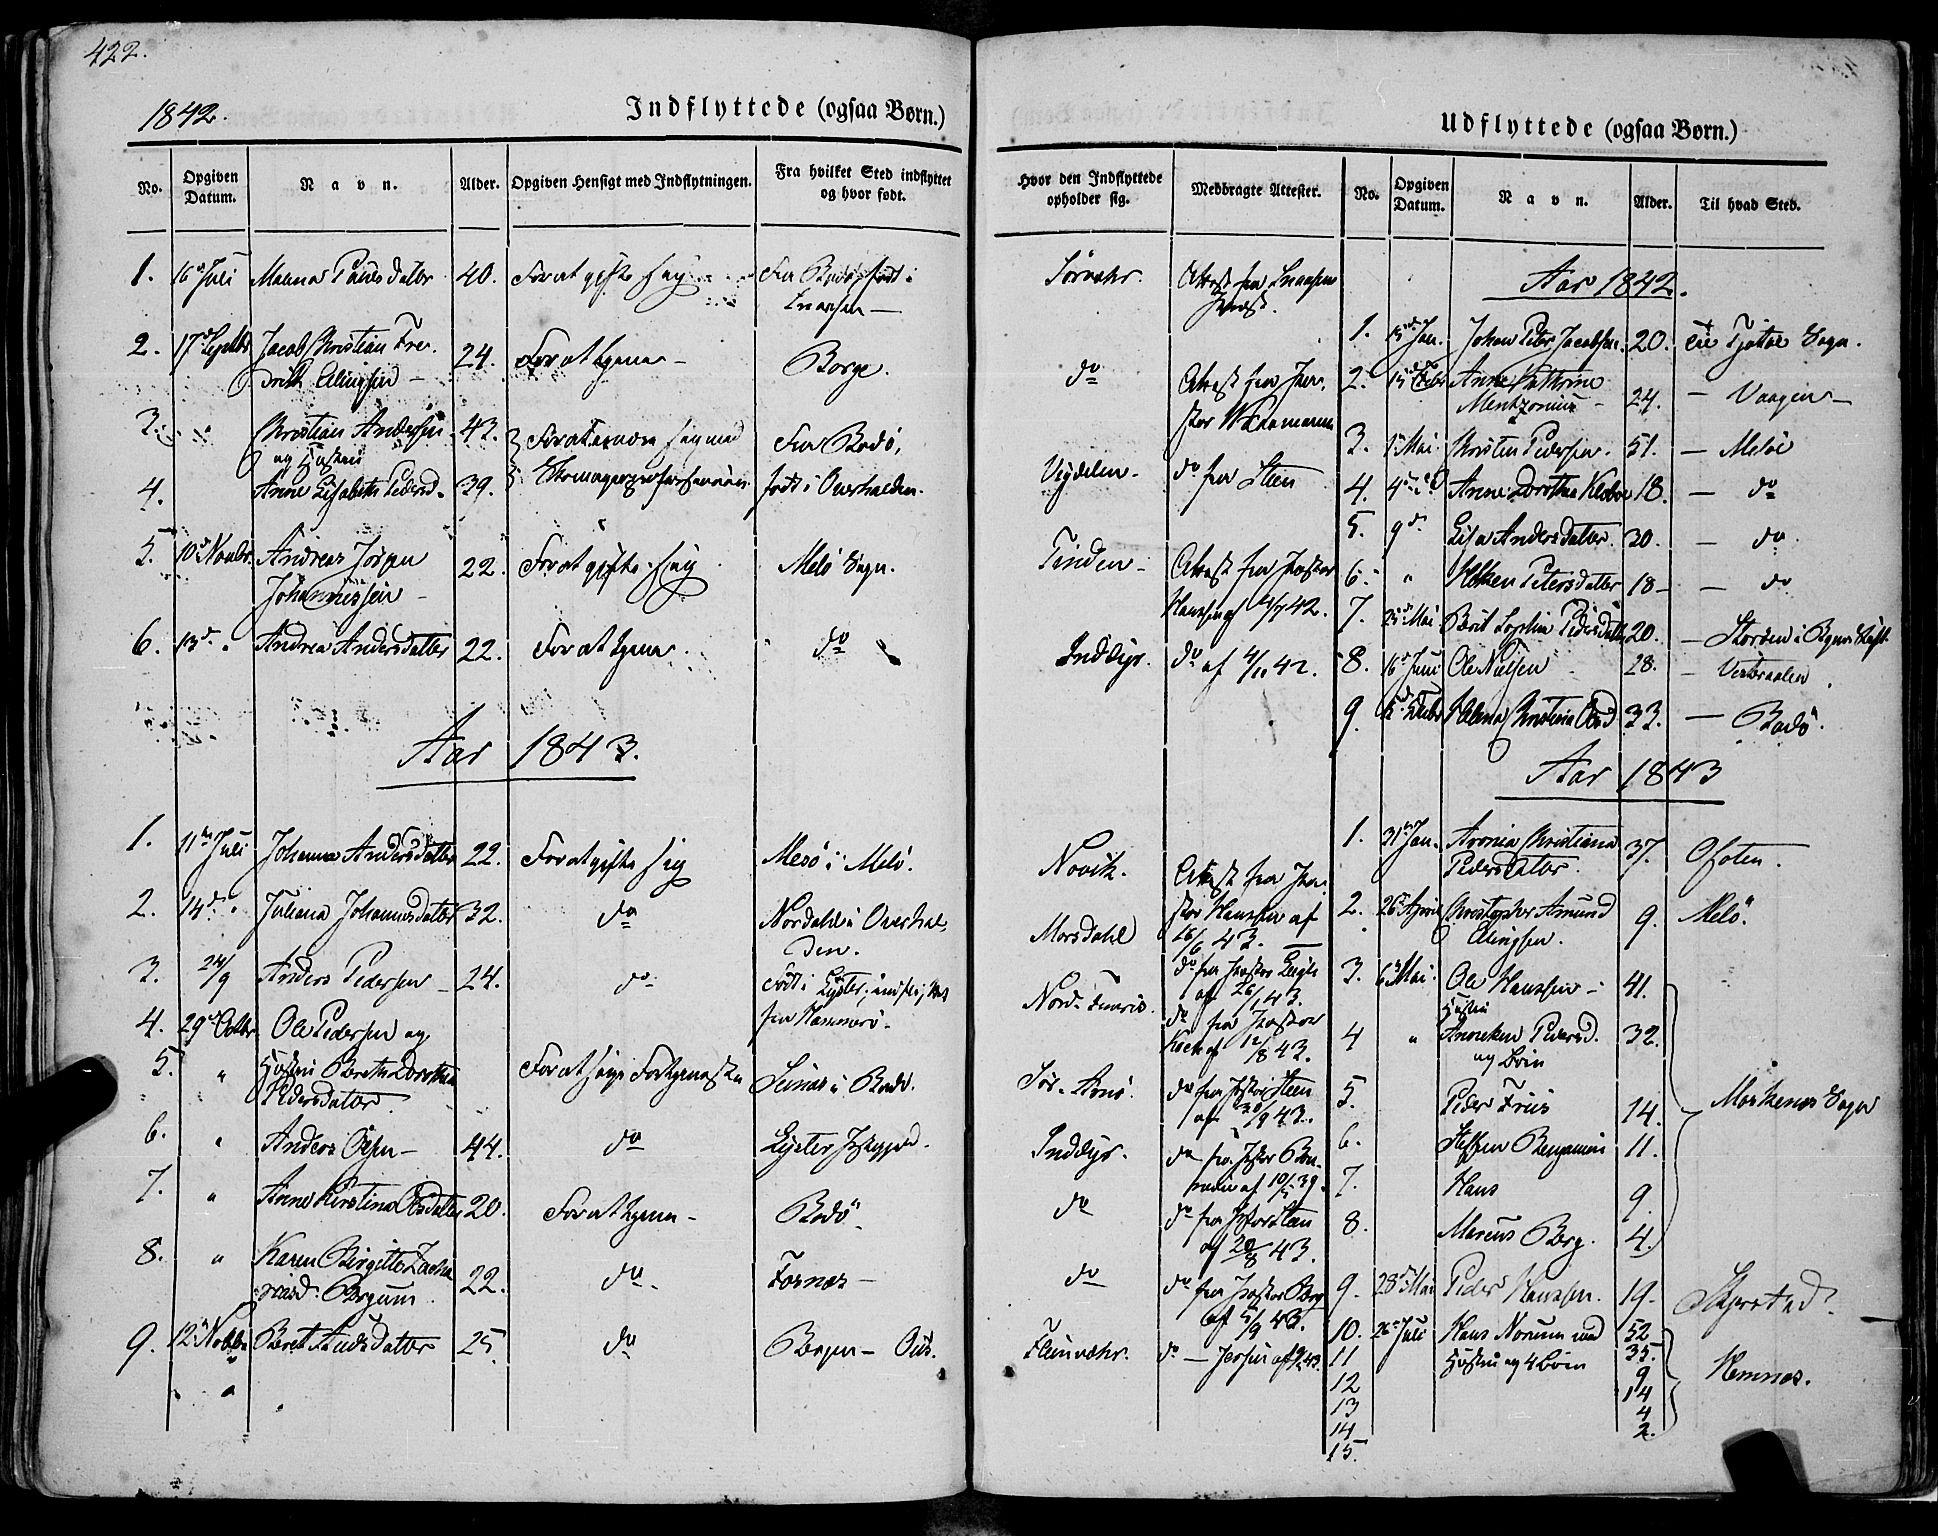 SAT, Ministerialprotokoller, klokkerbøker og fødselsregistre - Nordland, 805/L0097: Ministerialbok nr. 805A04, 1837-1861, s. 422